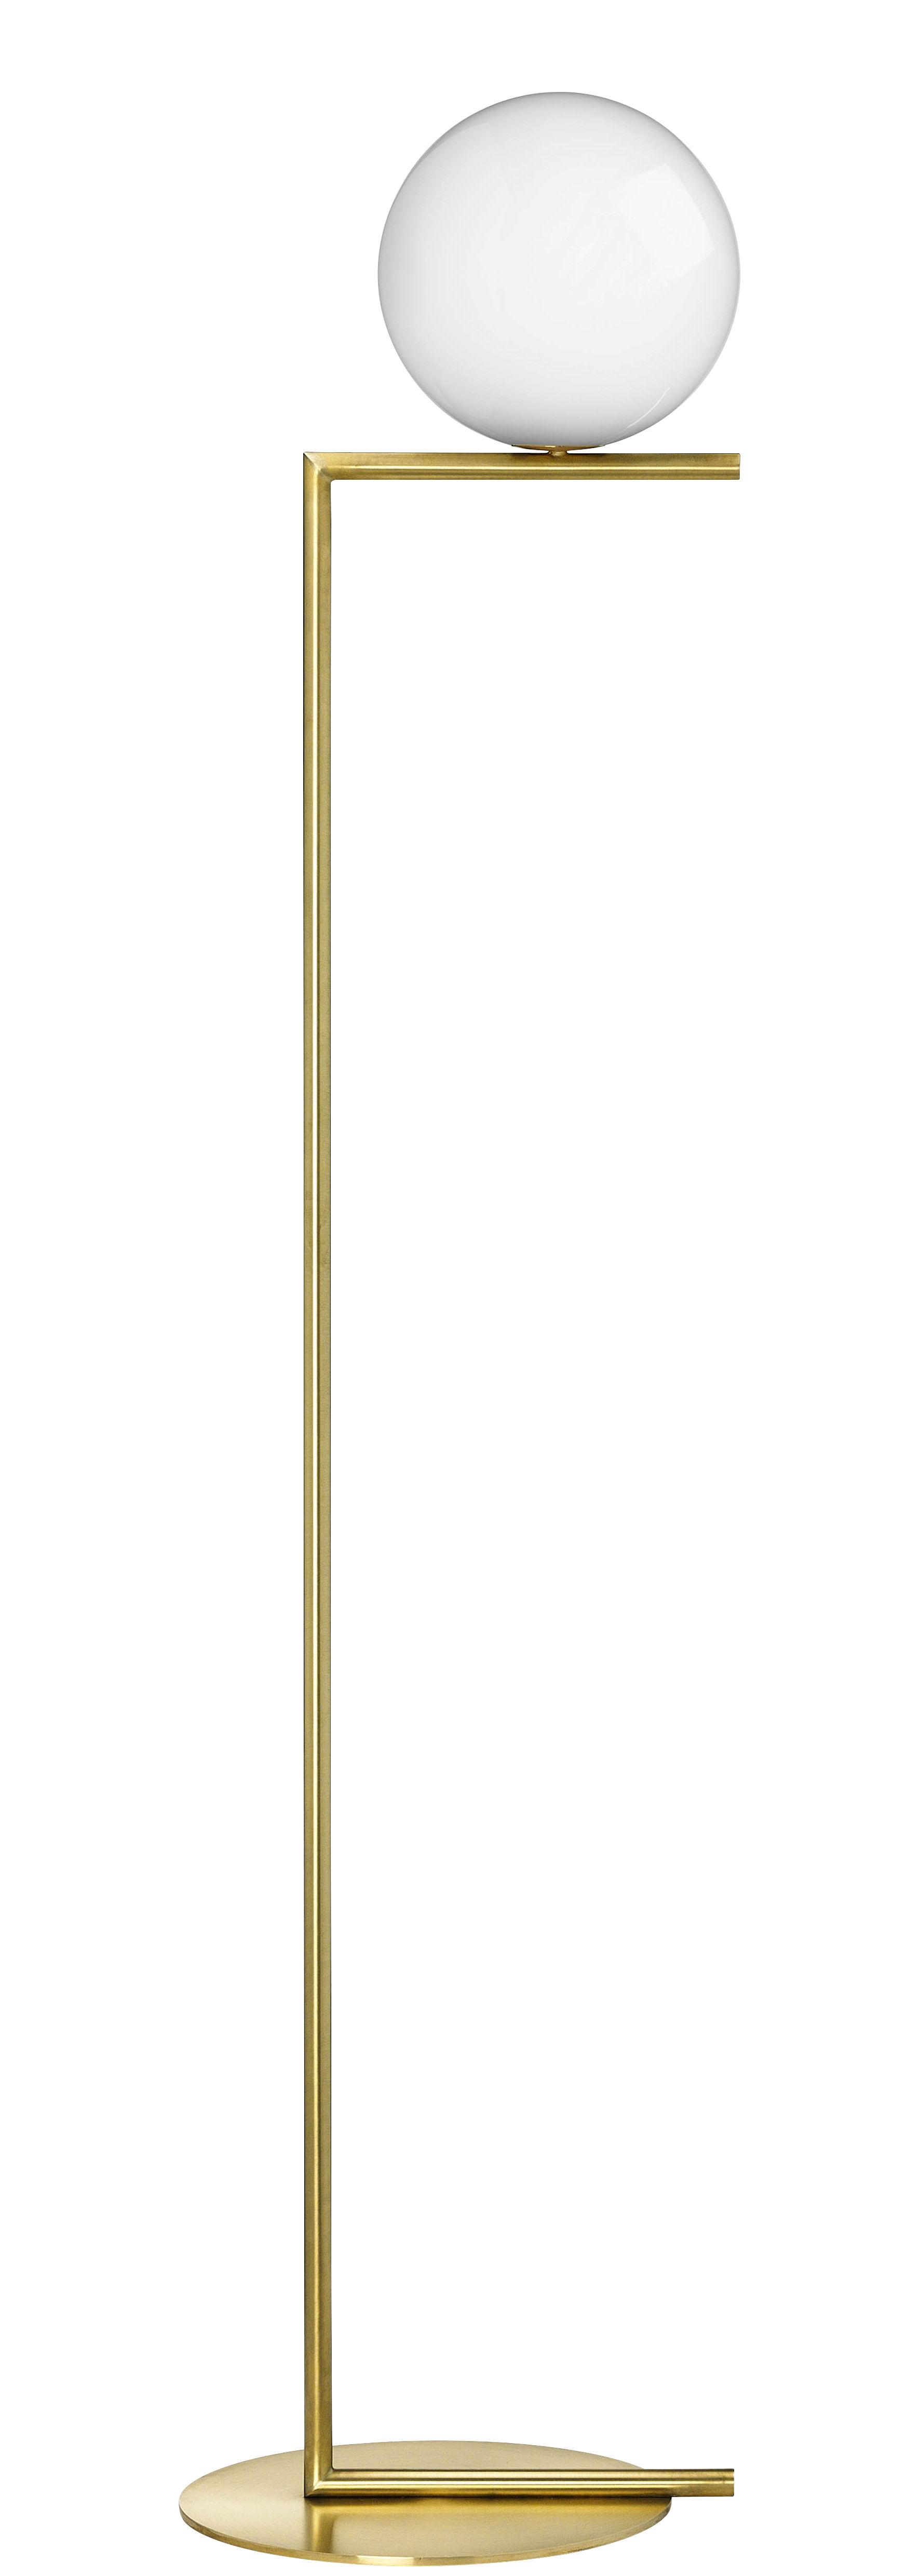 Lighting - Floor lamps - IC F1 Floor lamp by Flos - Brass - Blown glass, Steel